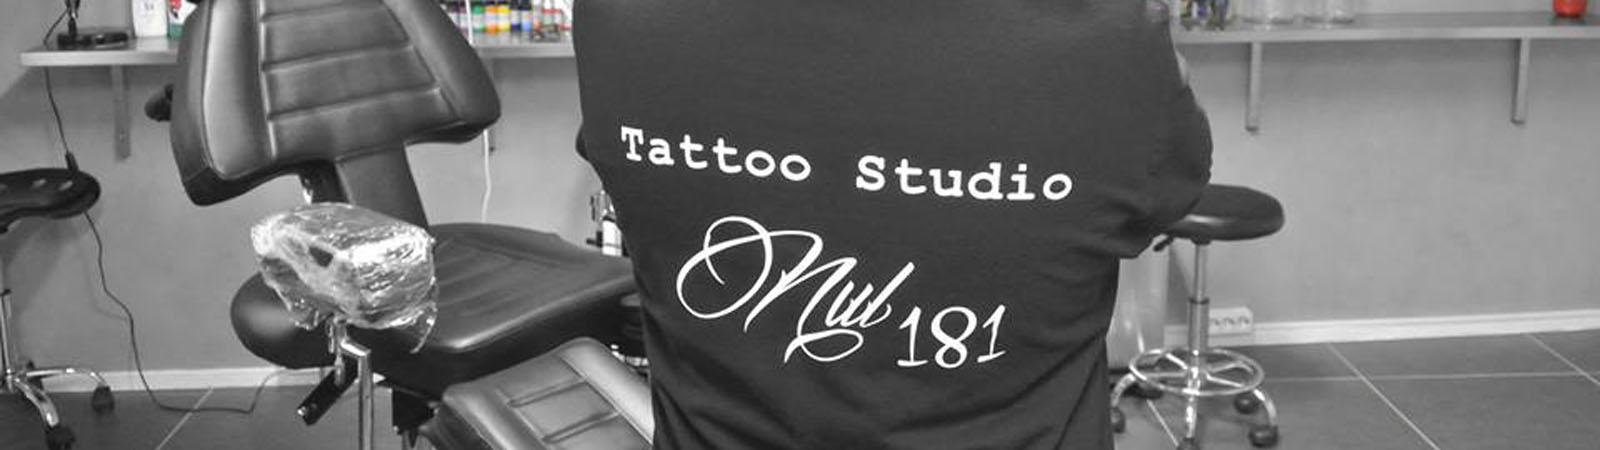 tattooslider